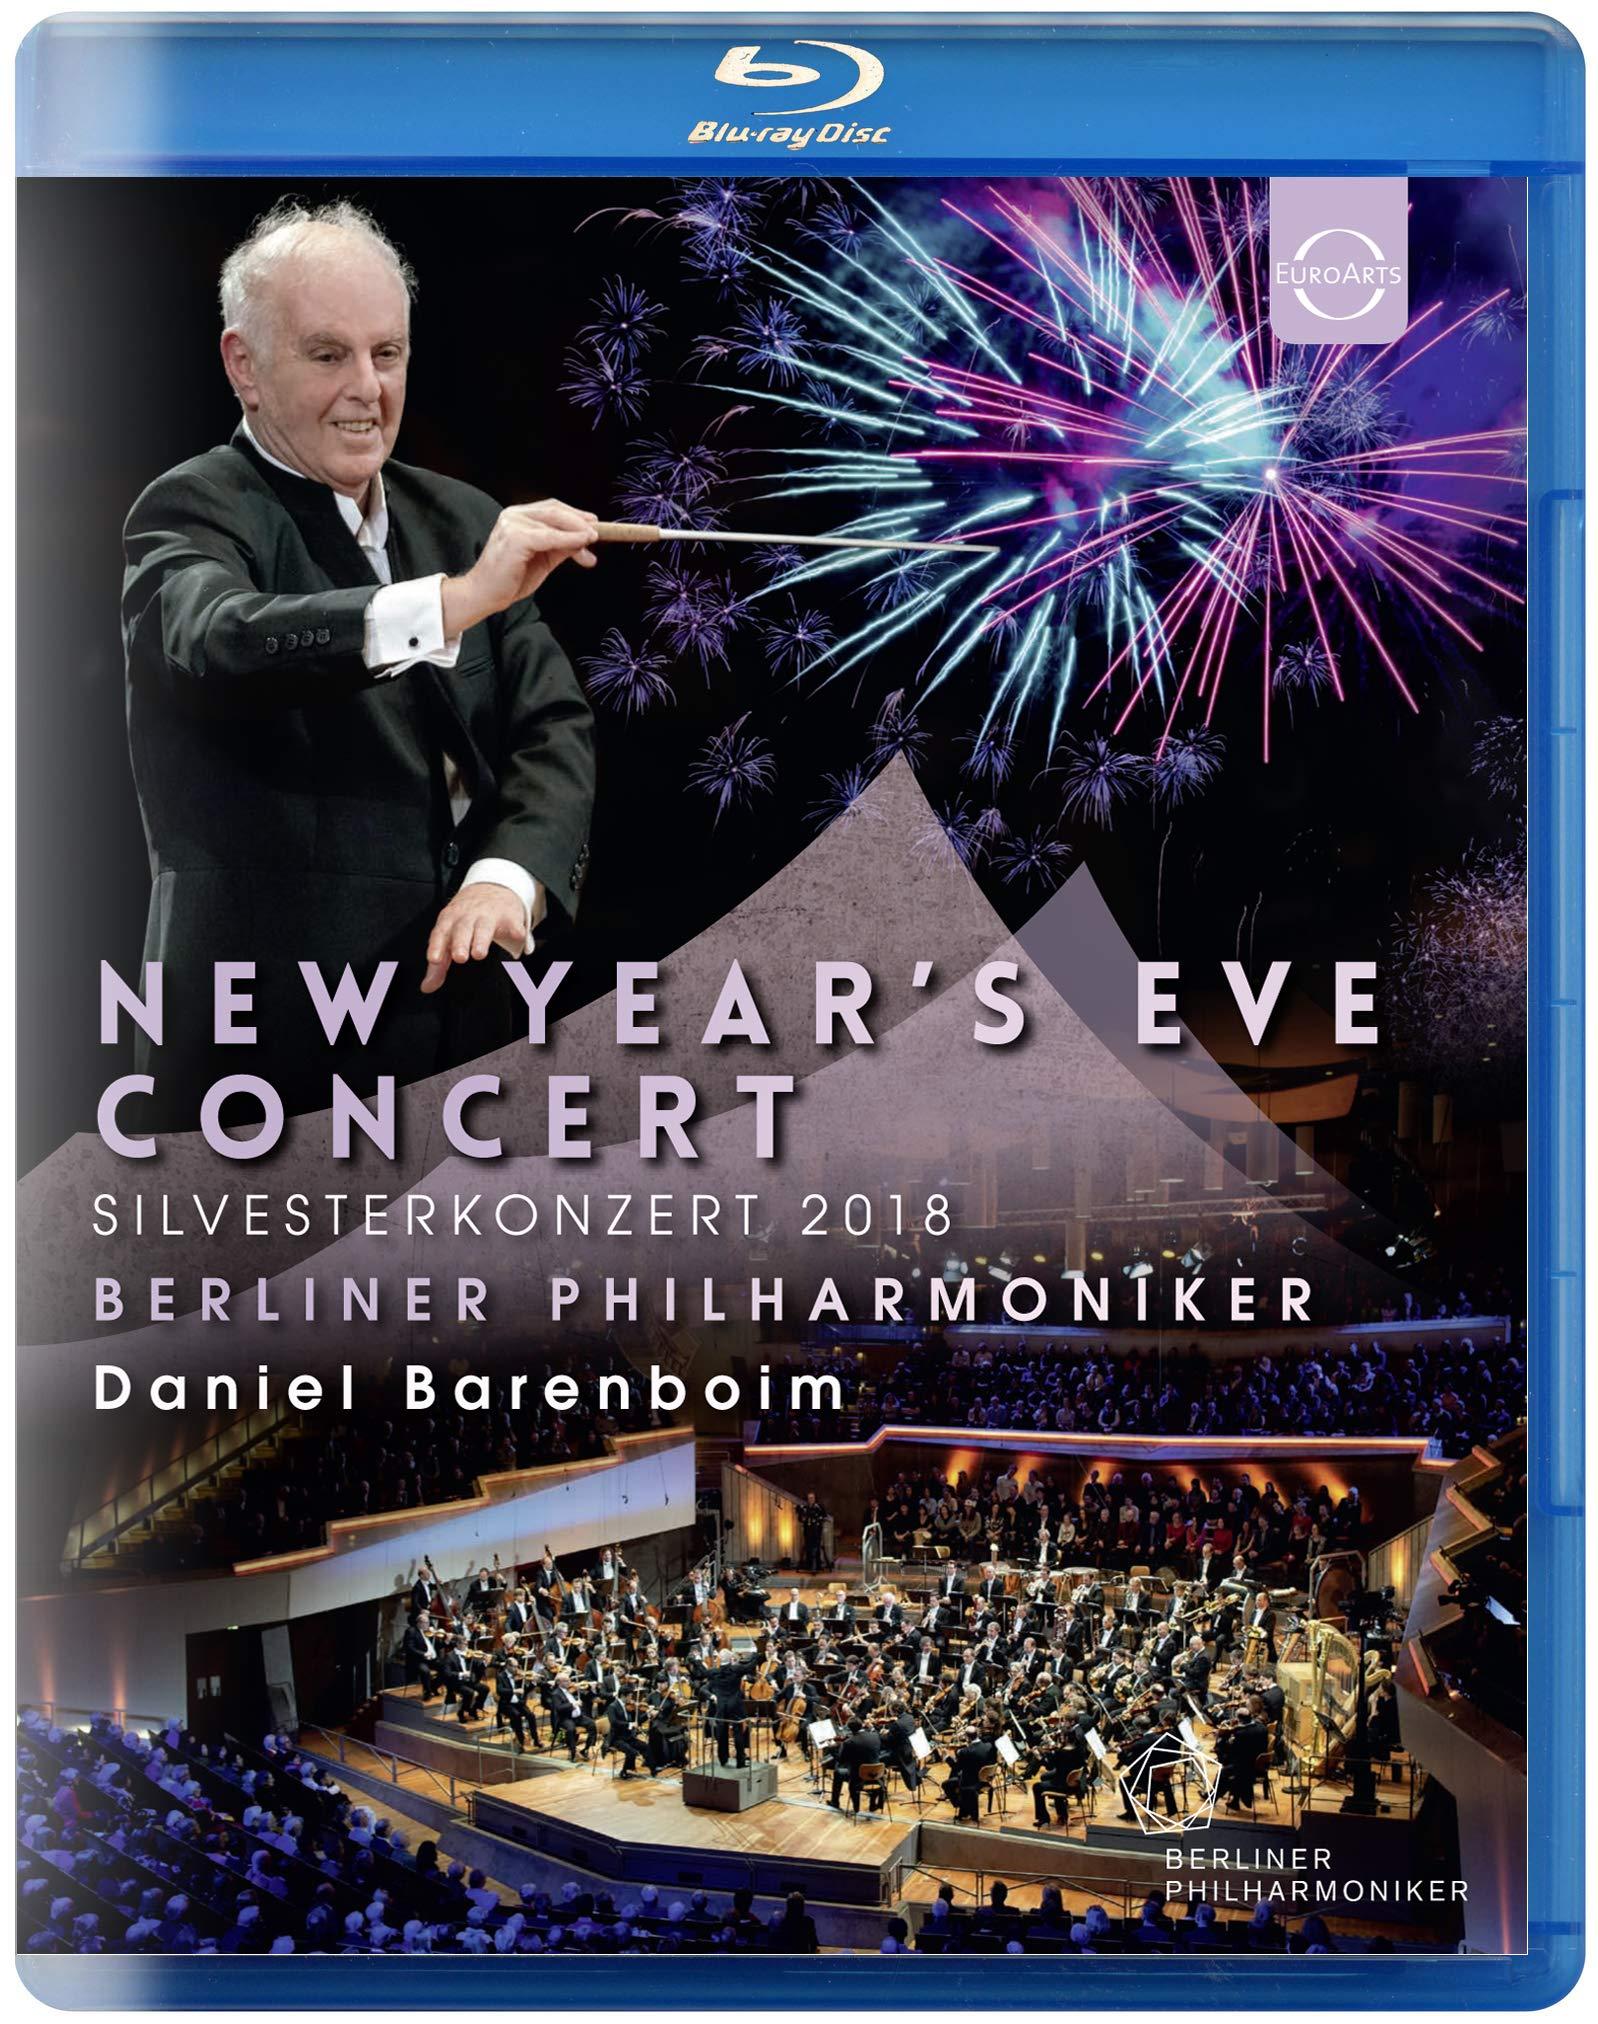 Blu-ray : DANIEL BARENBOIM & BERLINER PHILHARMONIKER - New Year's Eve Concert 2018 (United Kingdom - Import)